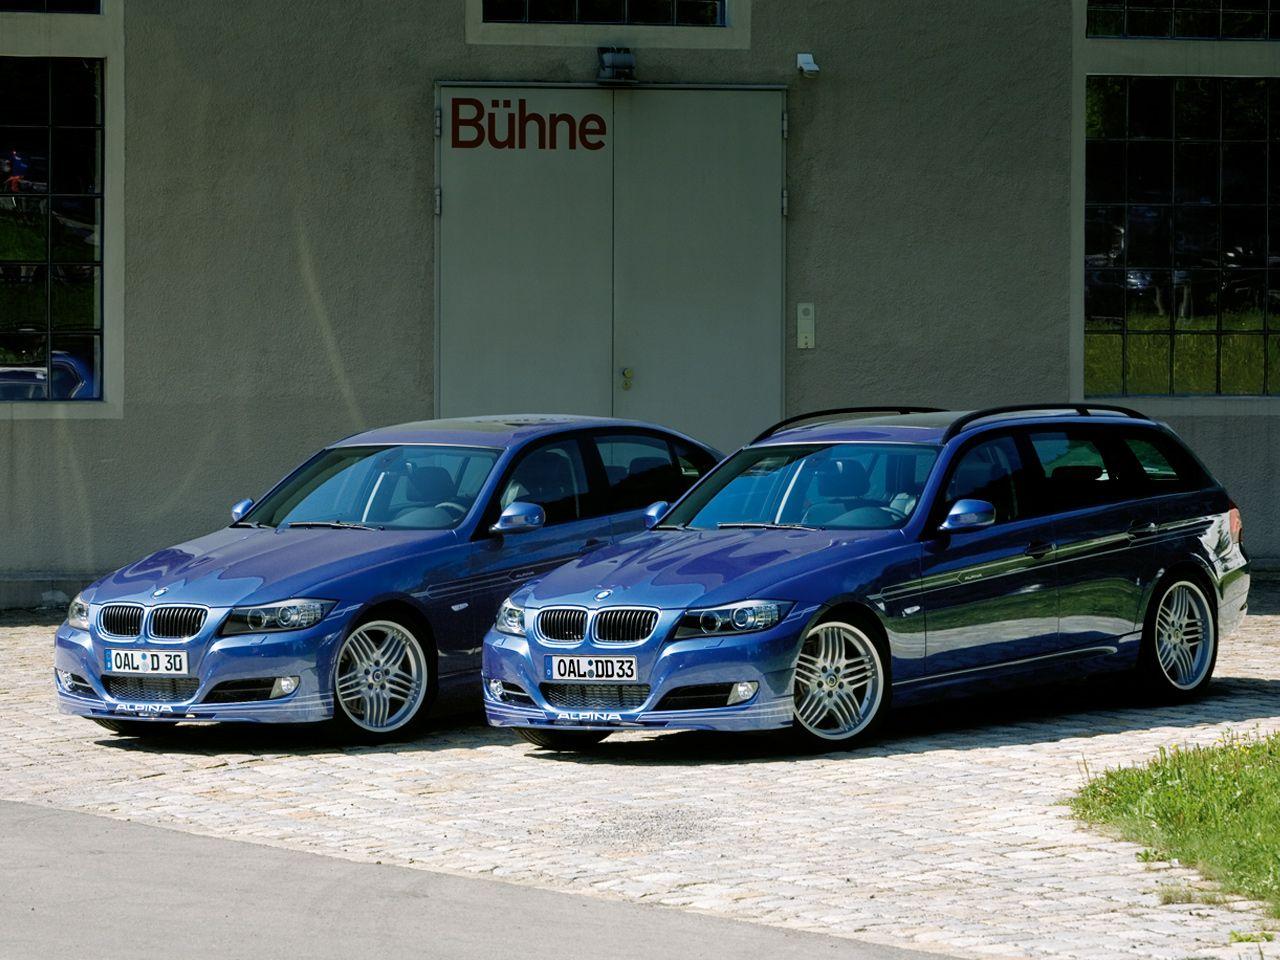 E91 alpina bmw d3 touring